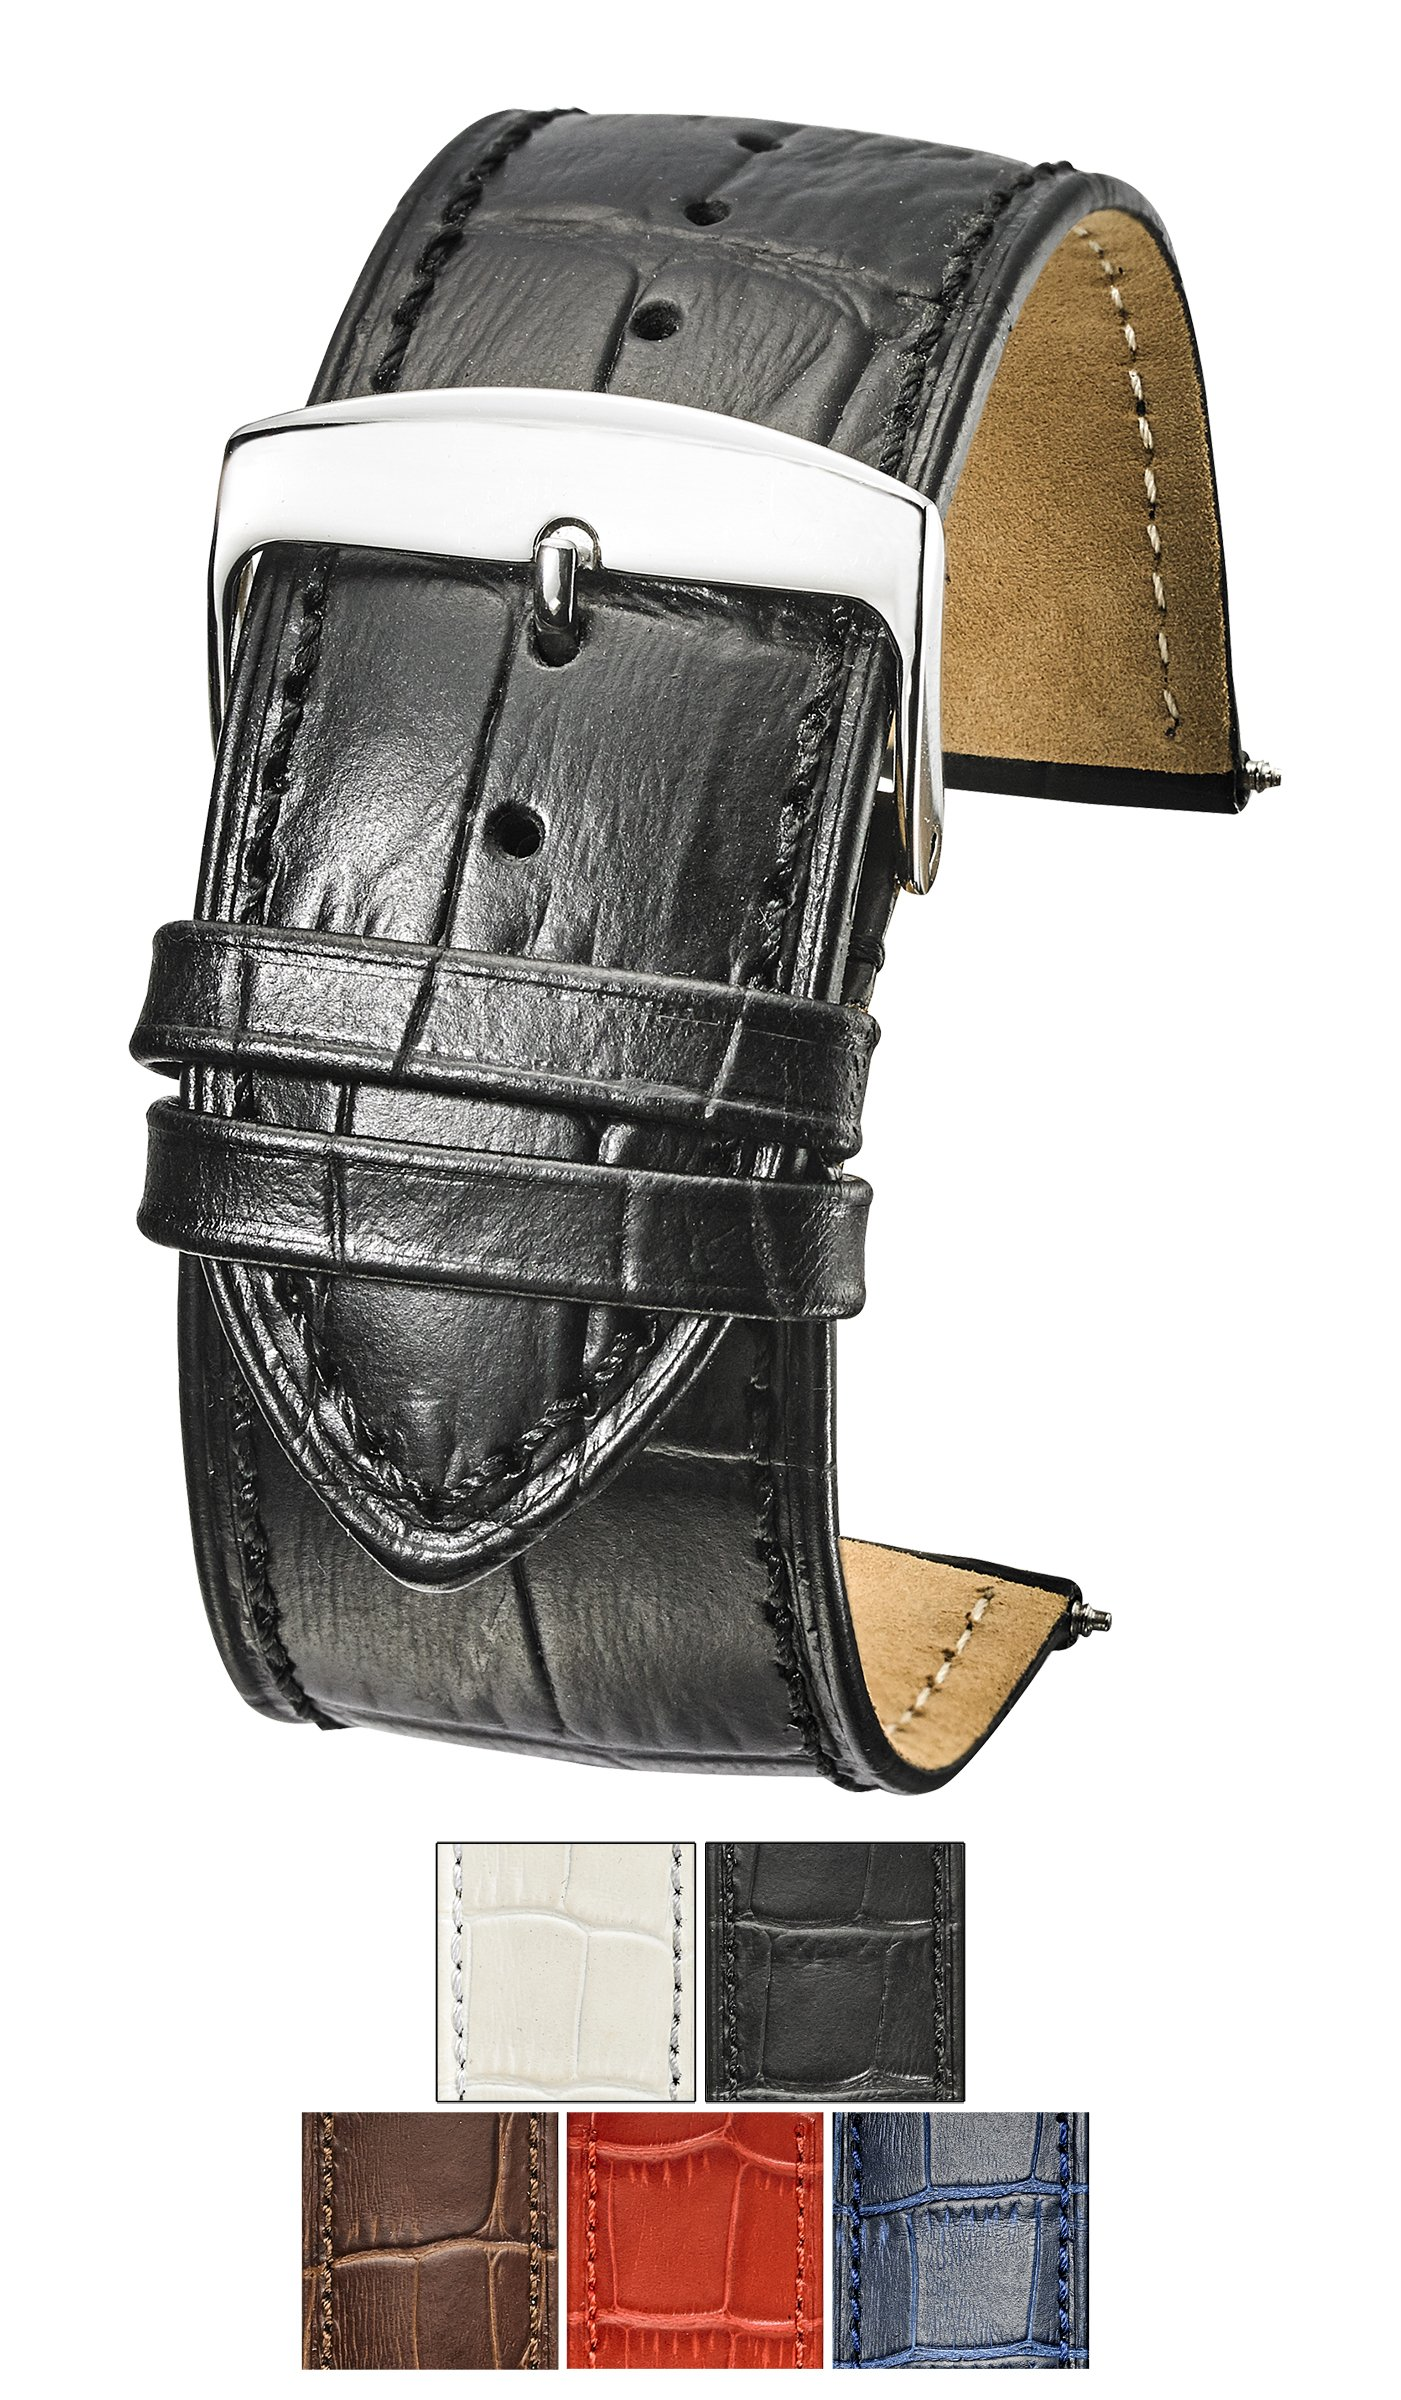 Genuine Alligator Grain Stitched Leather Watch Band (fits Wrist Sizes 6-7 1/2 inch) - Black - 26mm